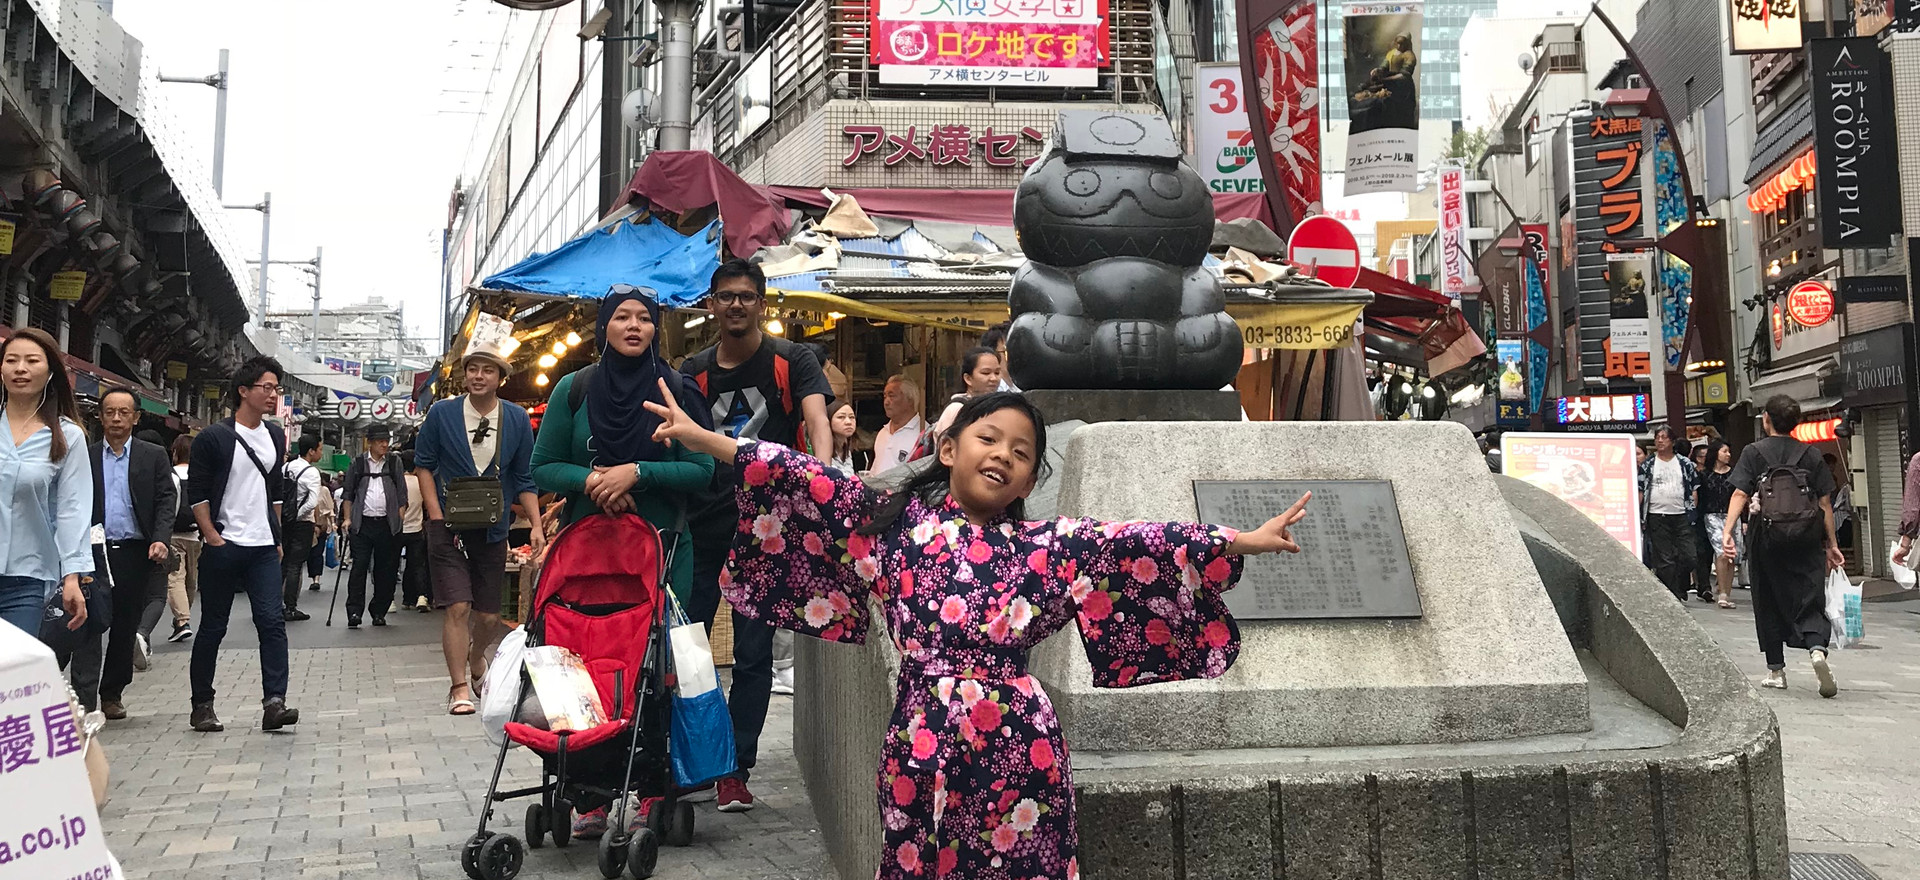 Ueno Street Market